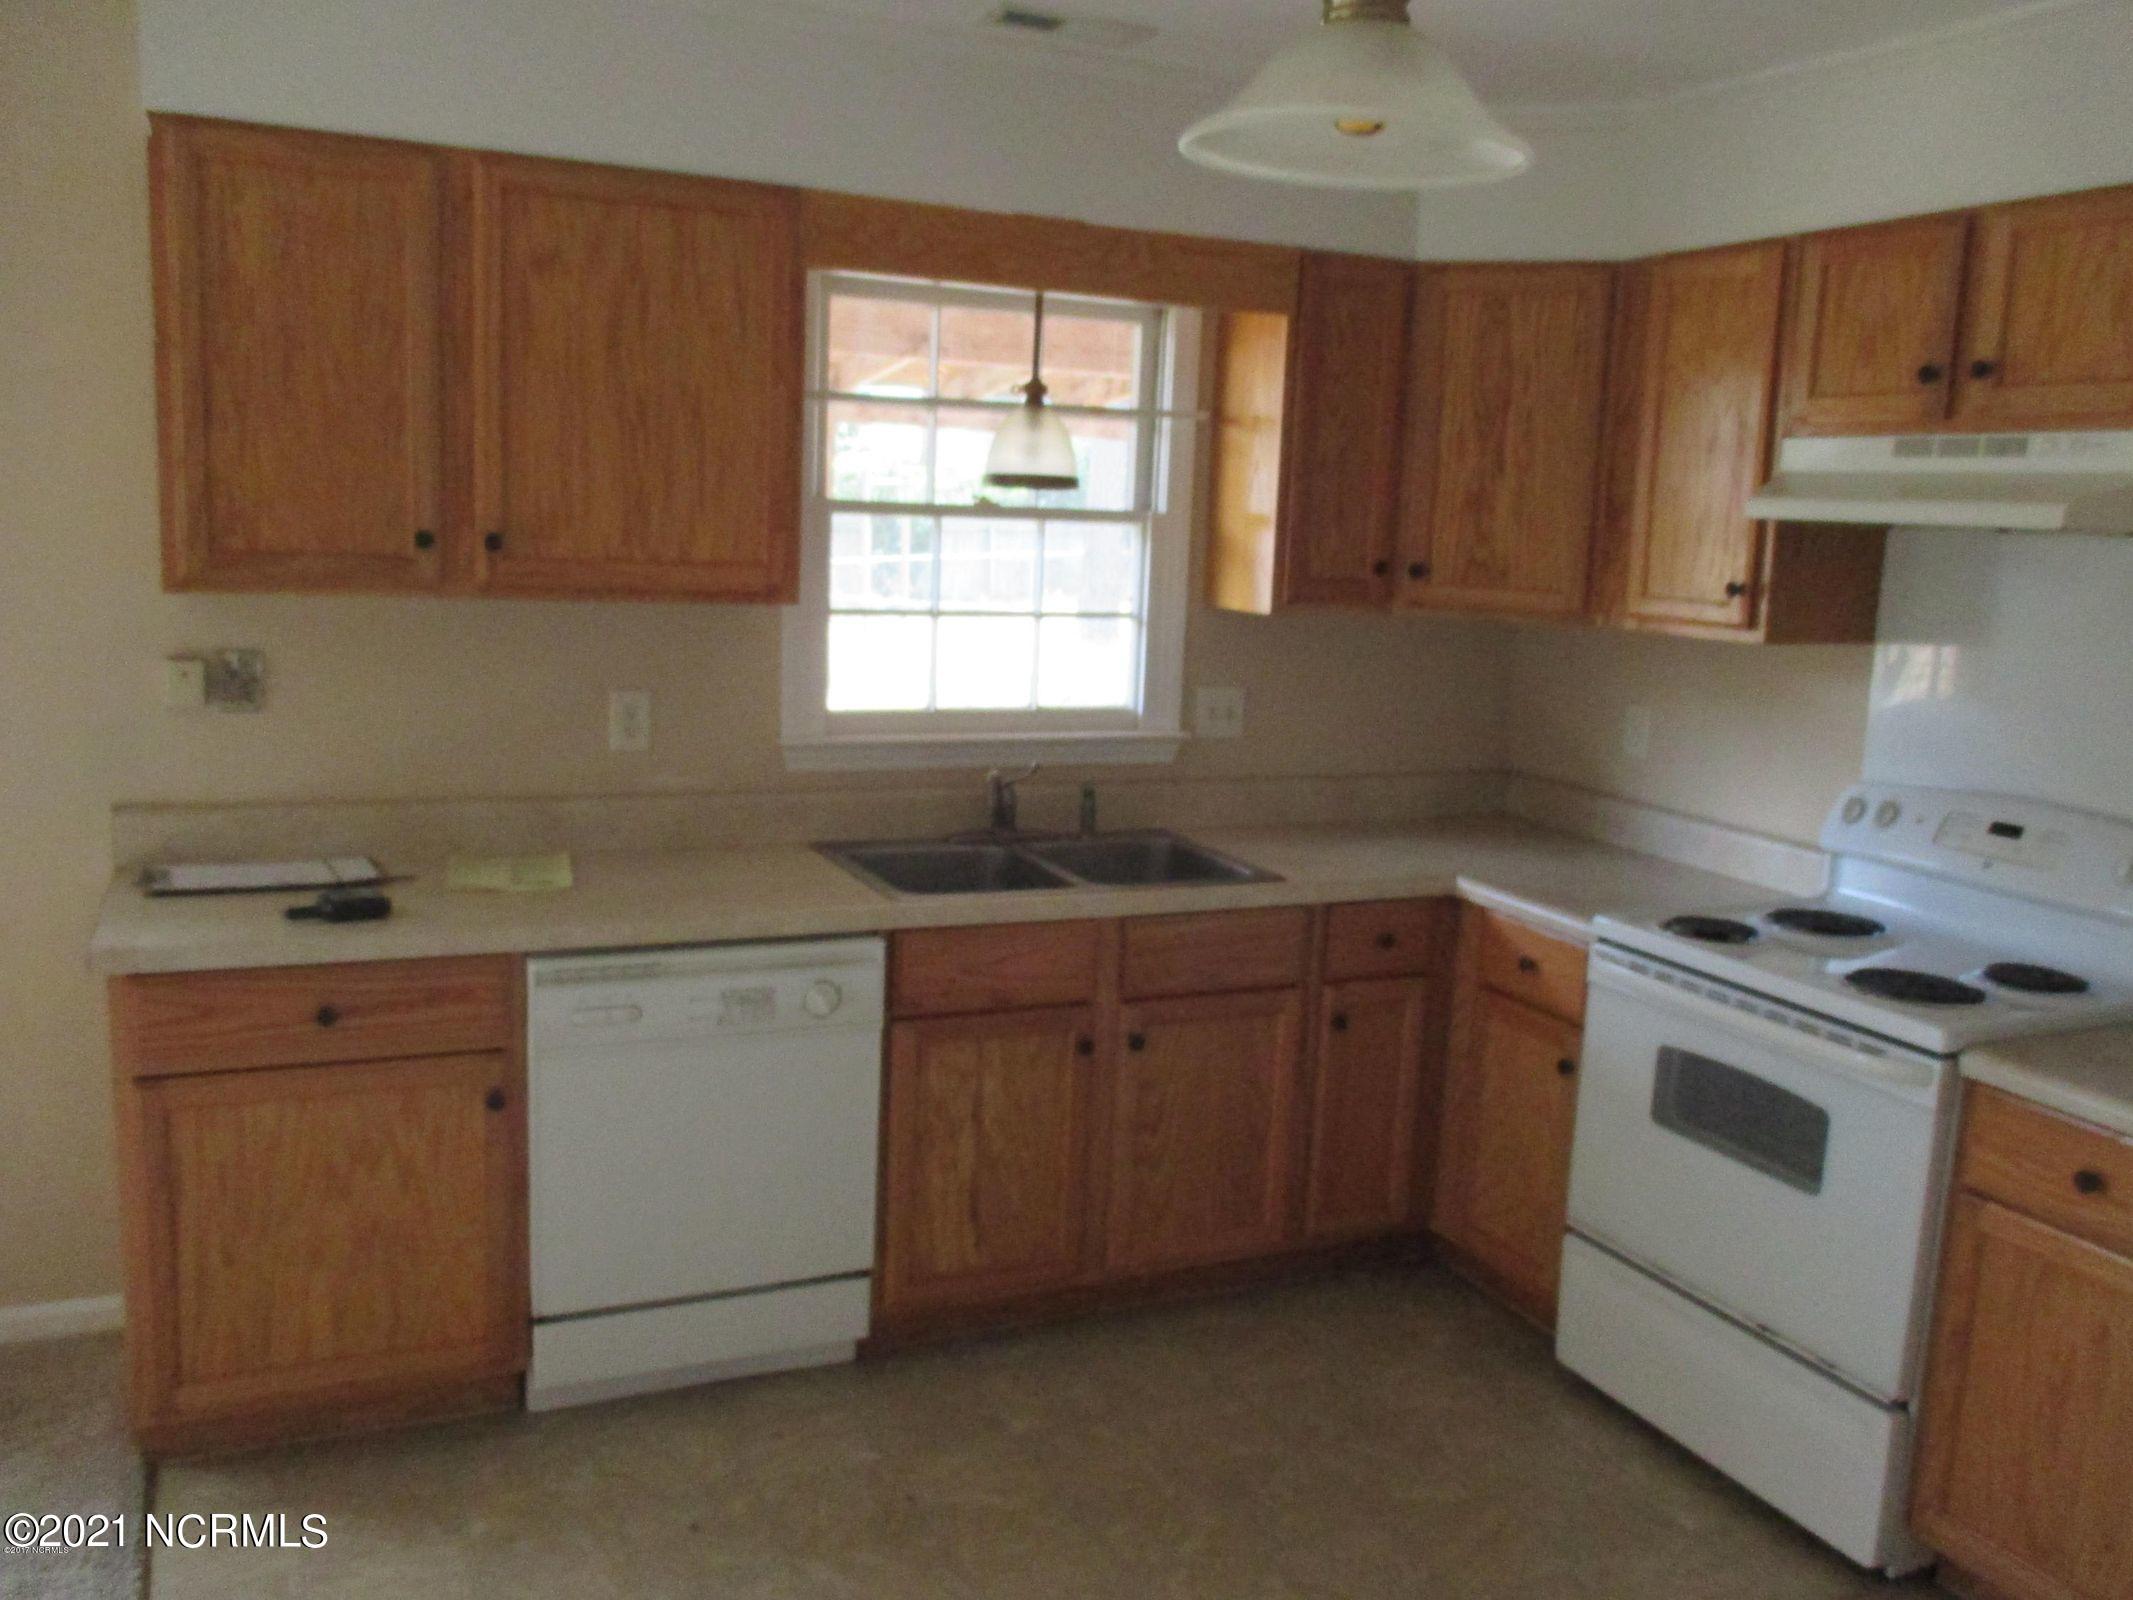 704 Brynn Marr Road, Jacksonville, North Carolina 28546, 3 Bedrooms Bedrooms, 6 Rooms Rooms,2 BathroomsBathrooms,Single family residence,For sale,Brynn Marr,100285320